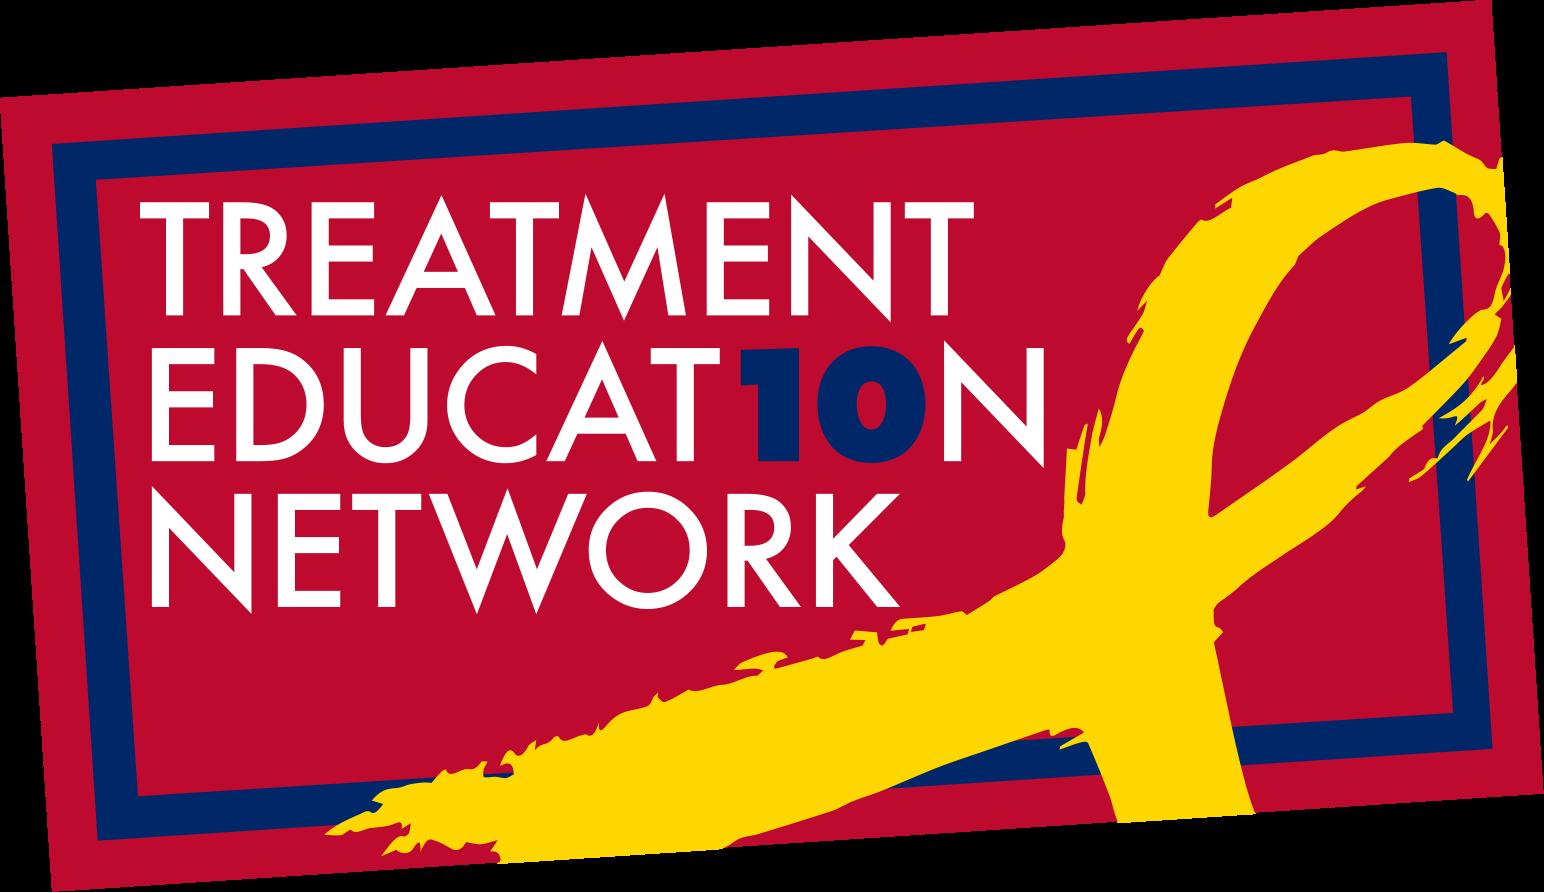 Treatment Educat10n Network